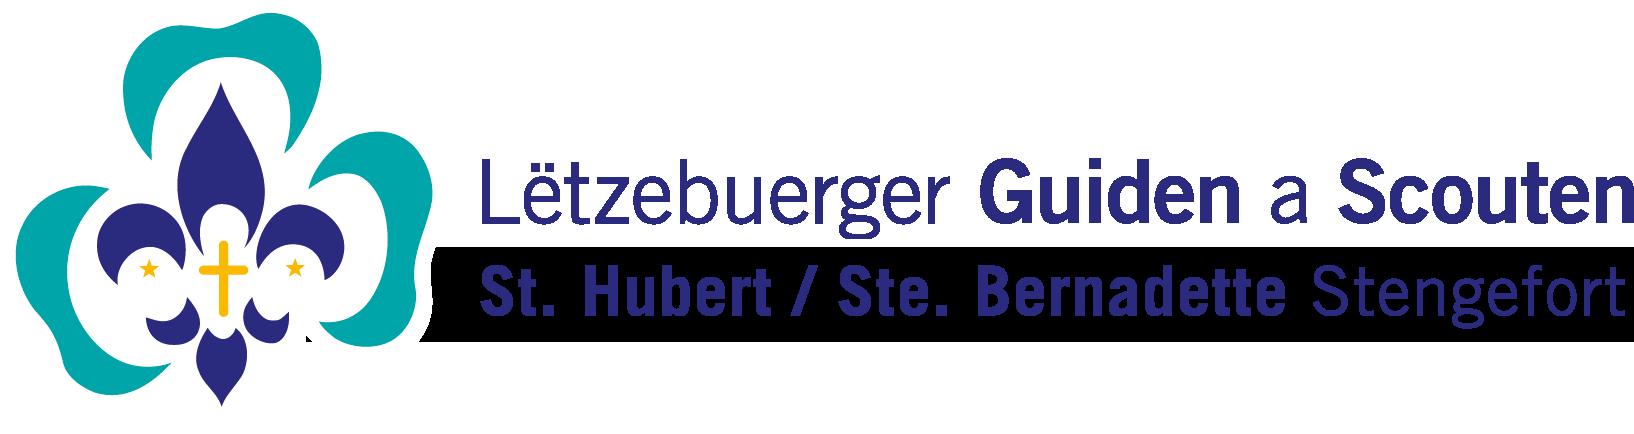 LGS - St. Hubert / Ste. Bernadette Stengefort